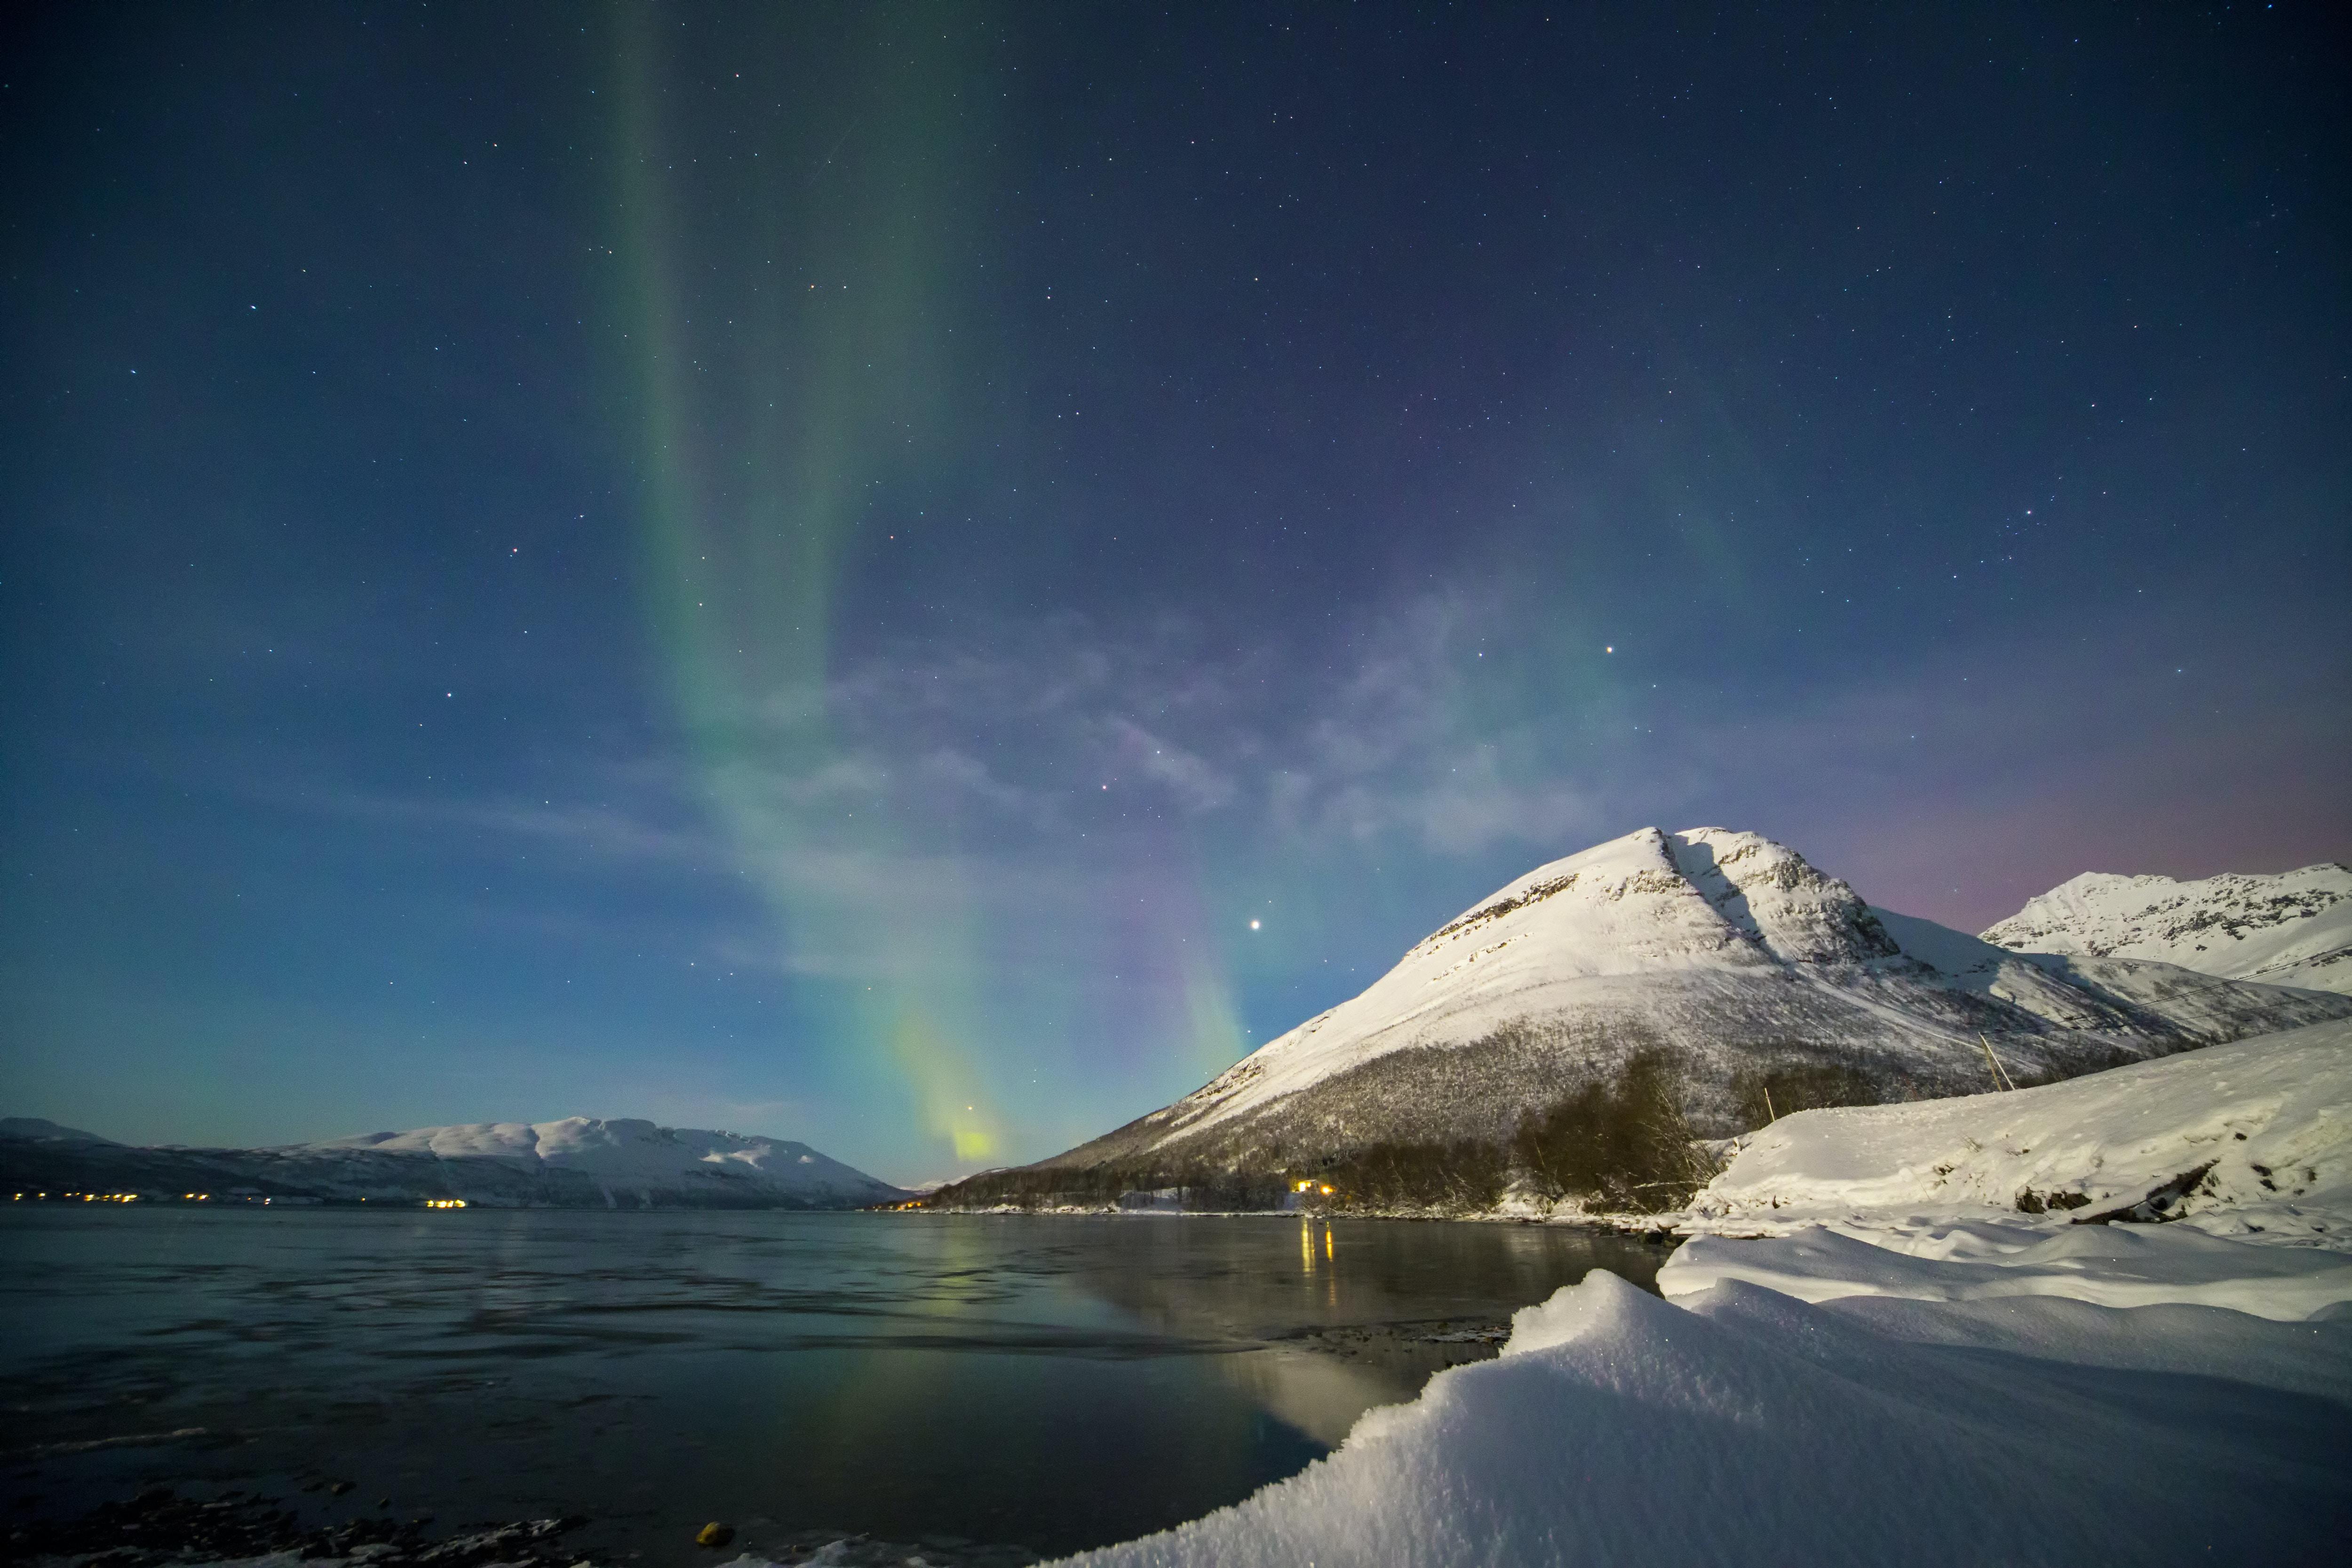 Aurora Borealis on body of water during daytime